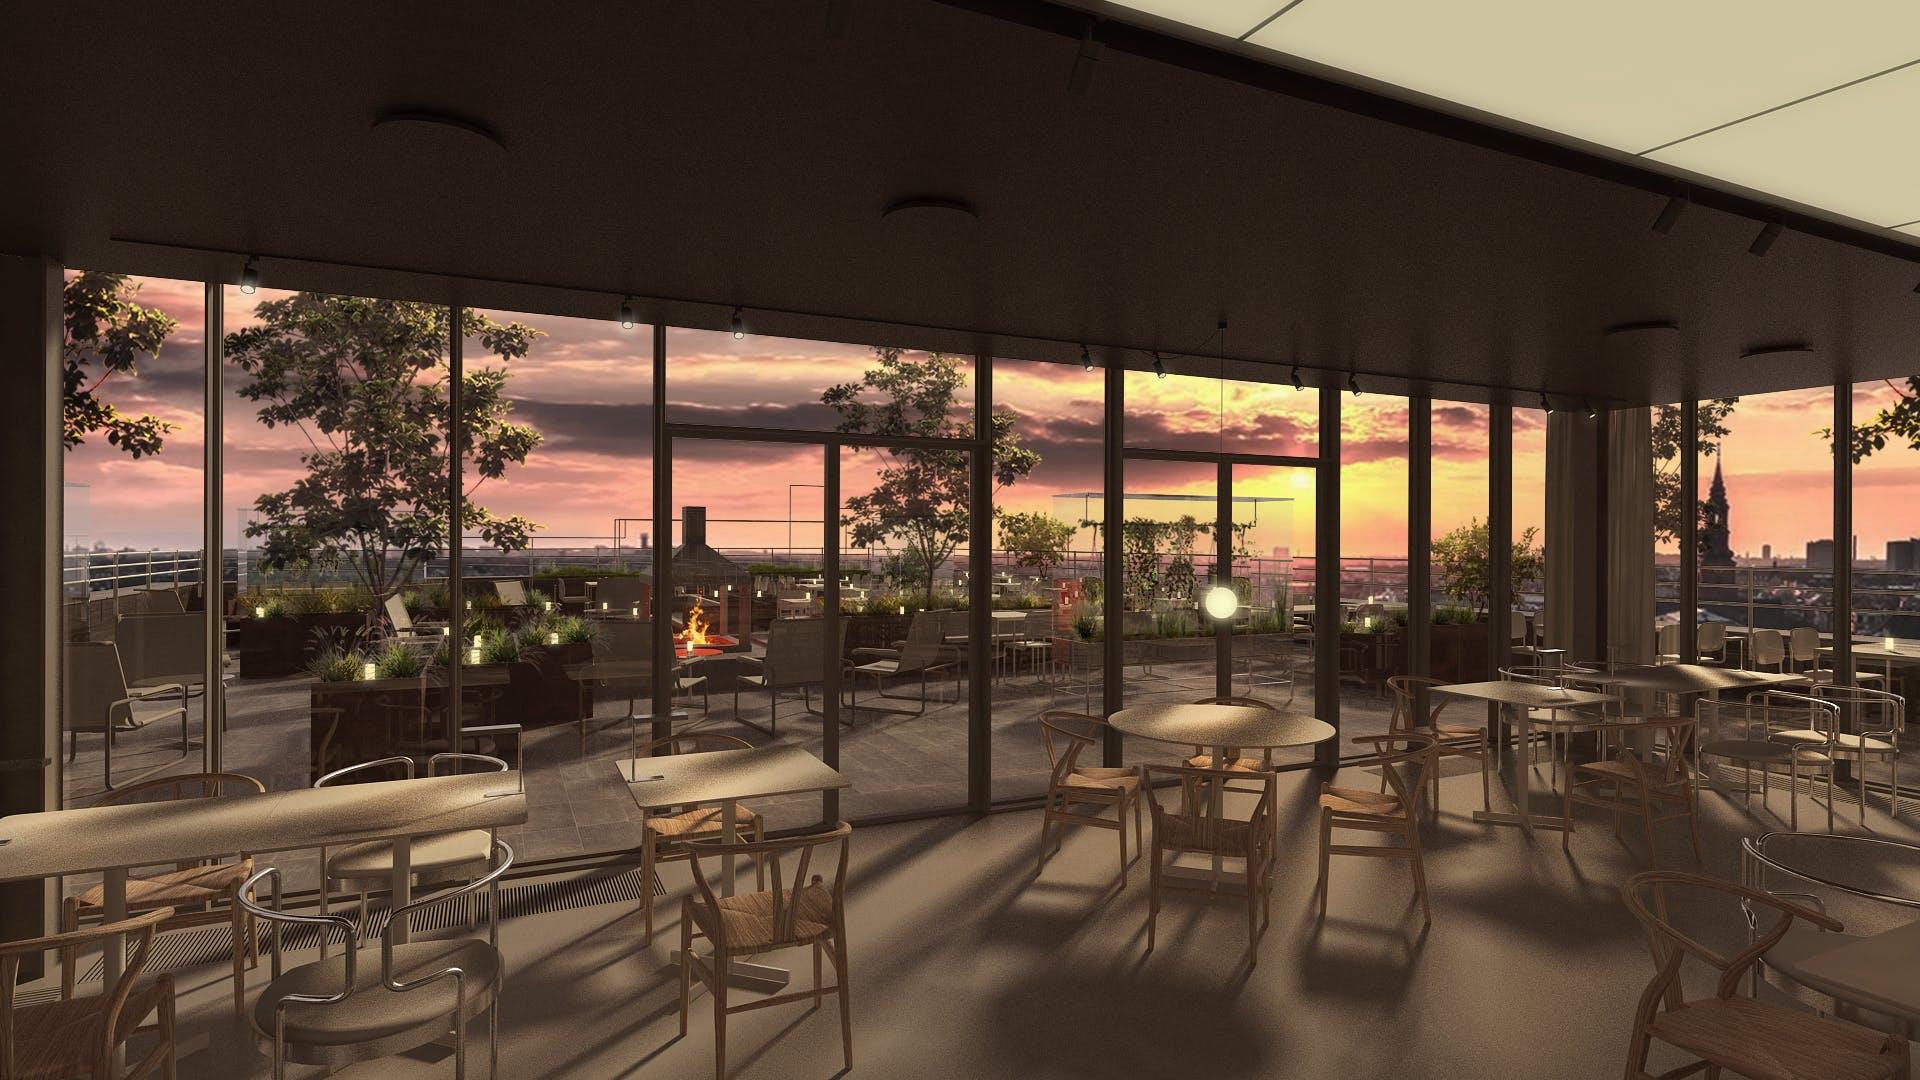 tramonto restaurant københavn carlsberg hotel ottilia